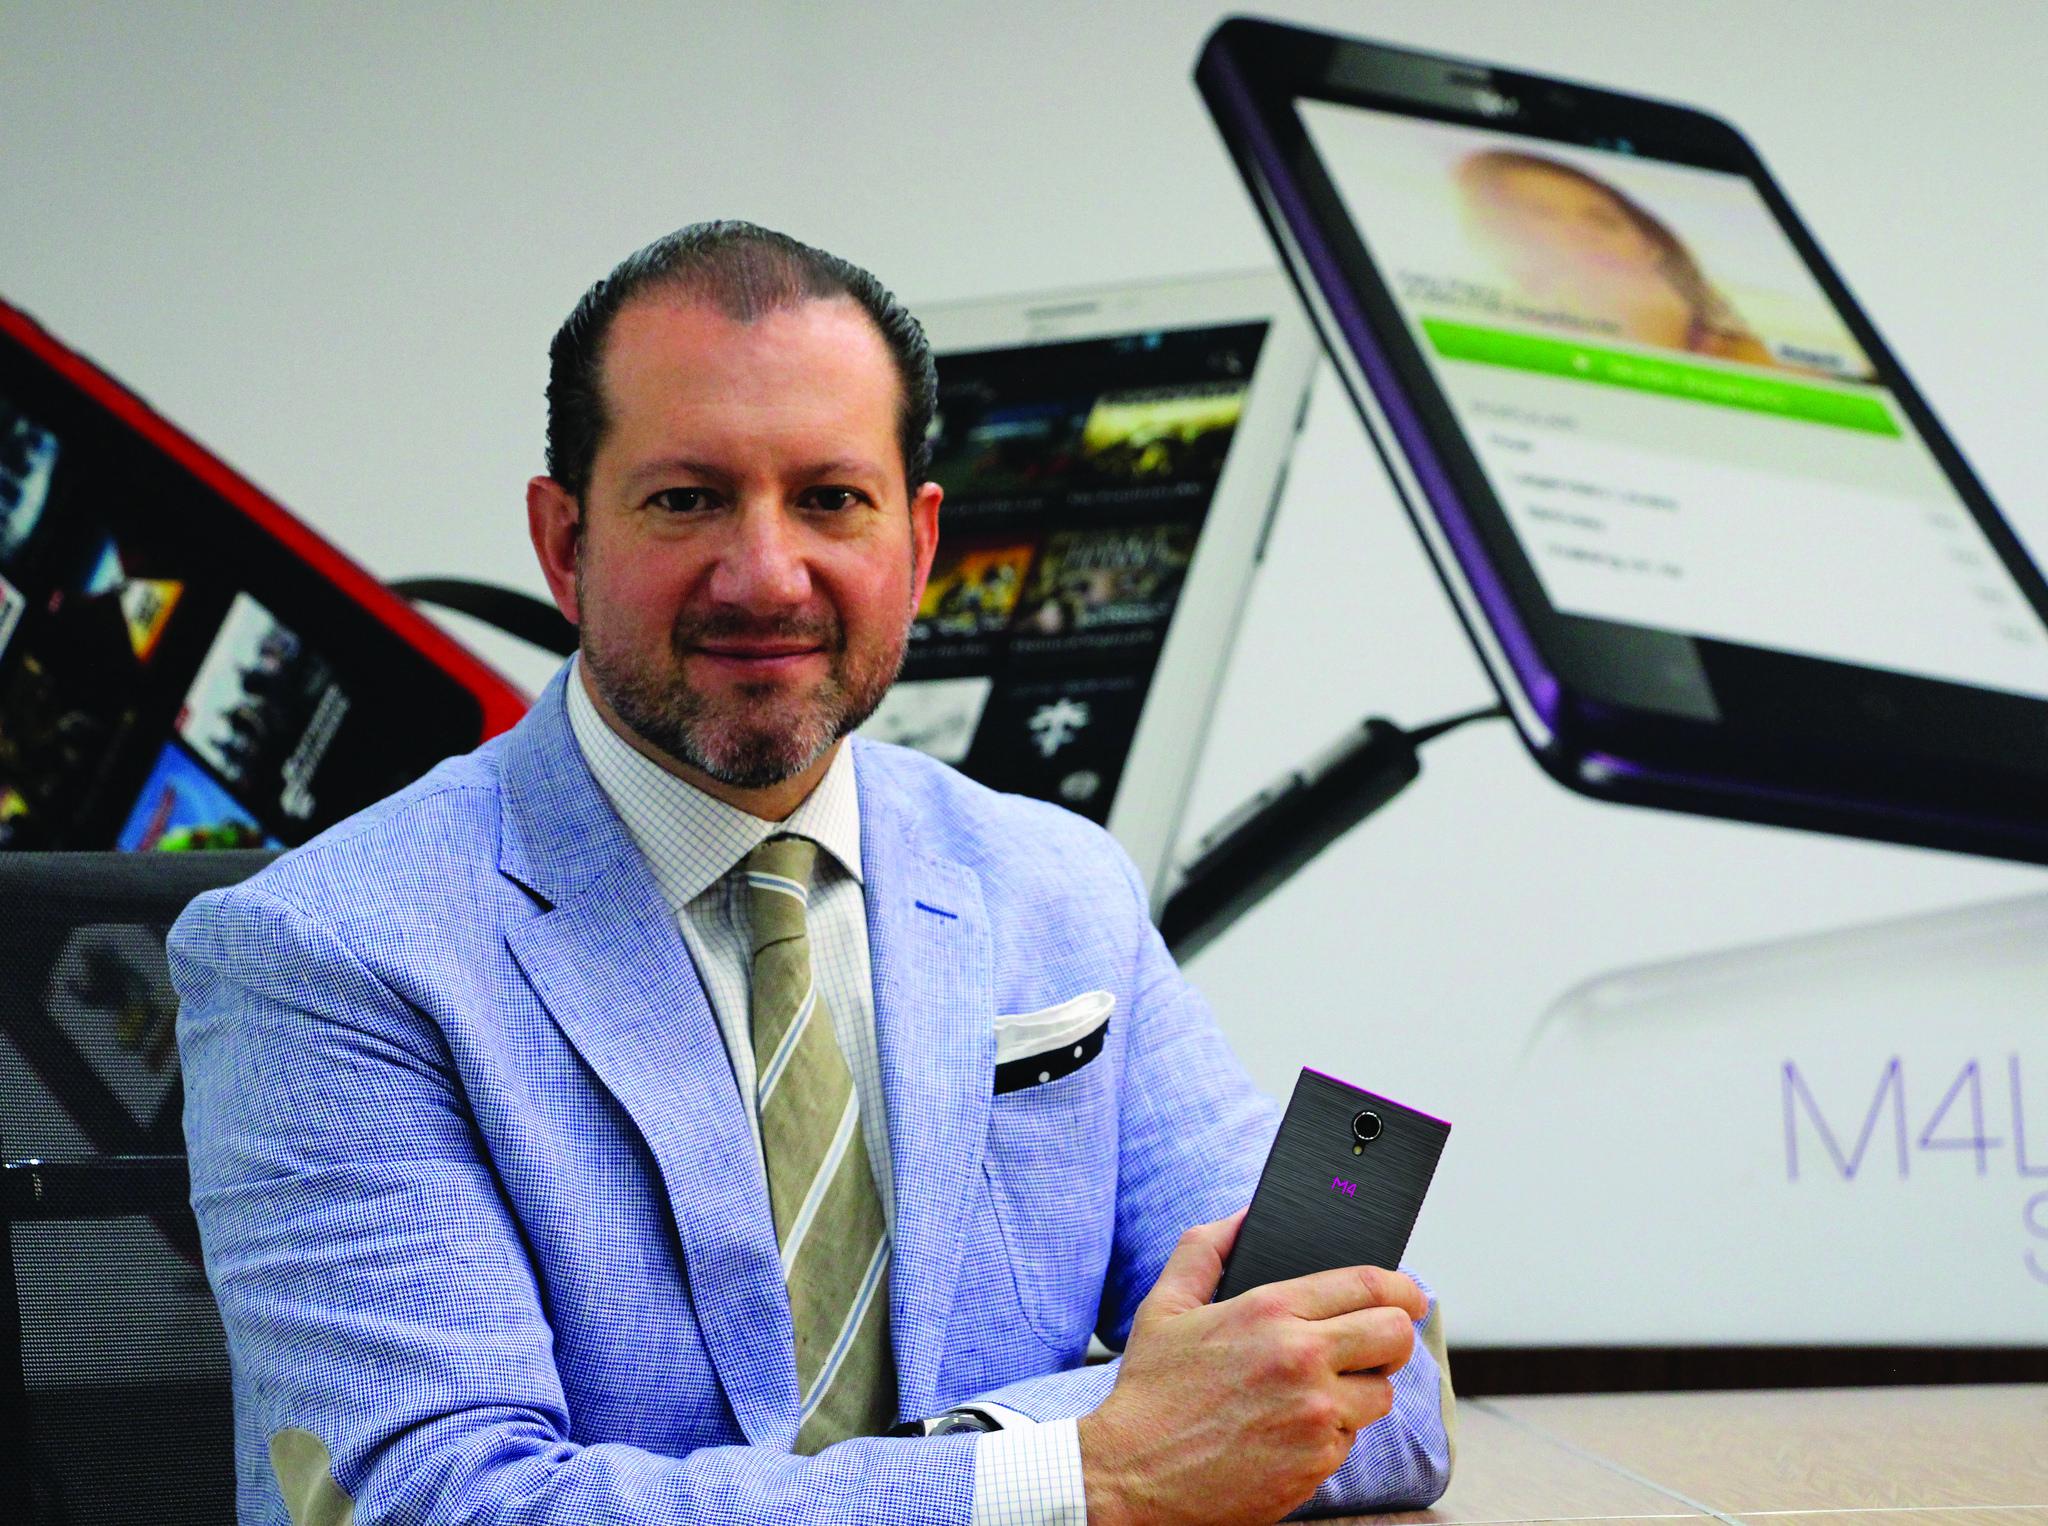 Javier De Antuñano, CEO de M4 para América Latina